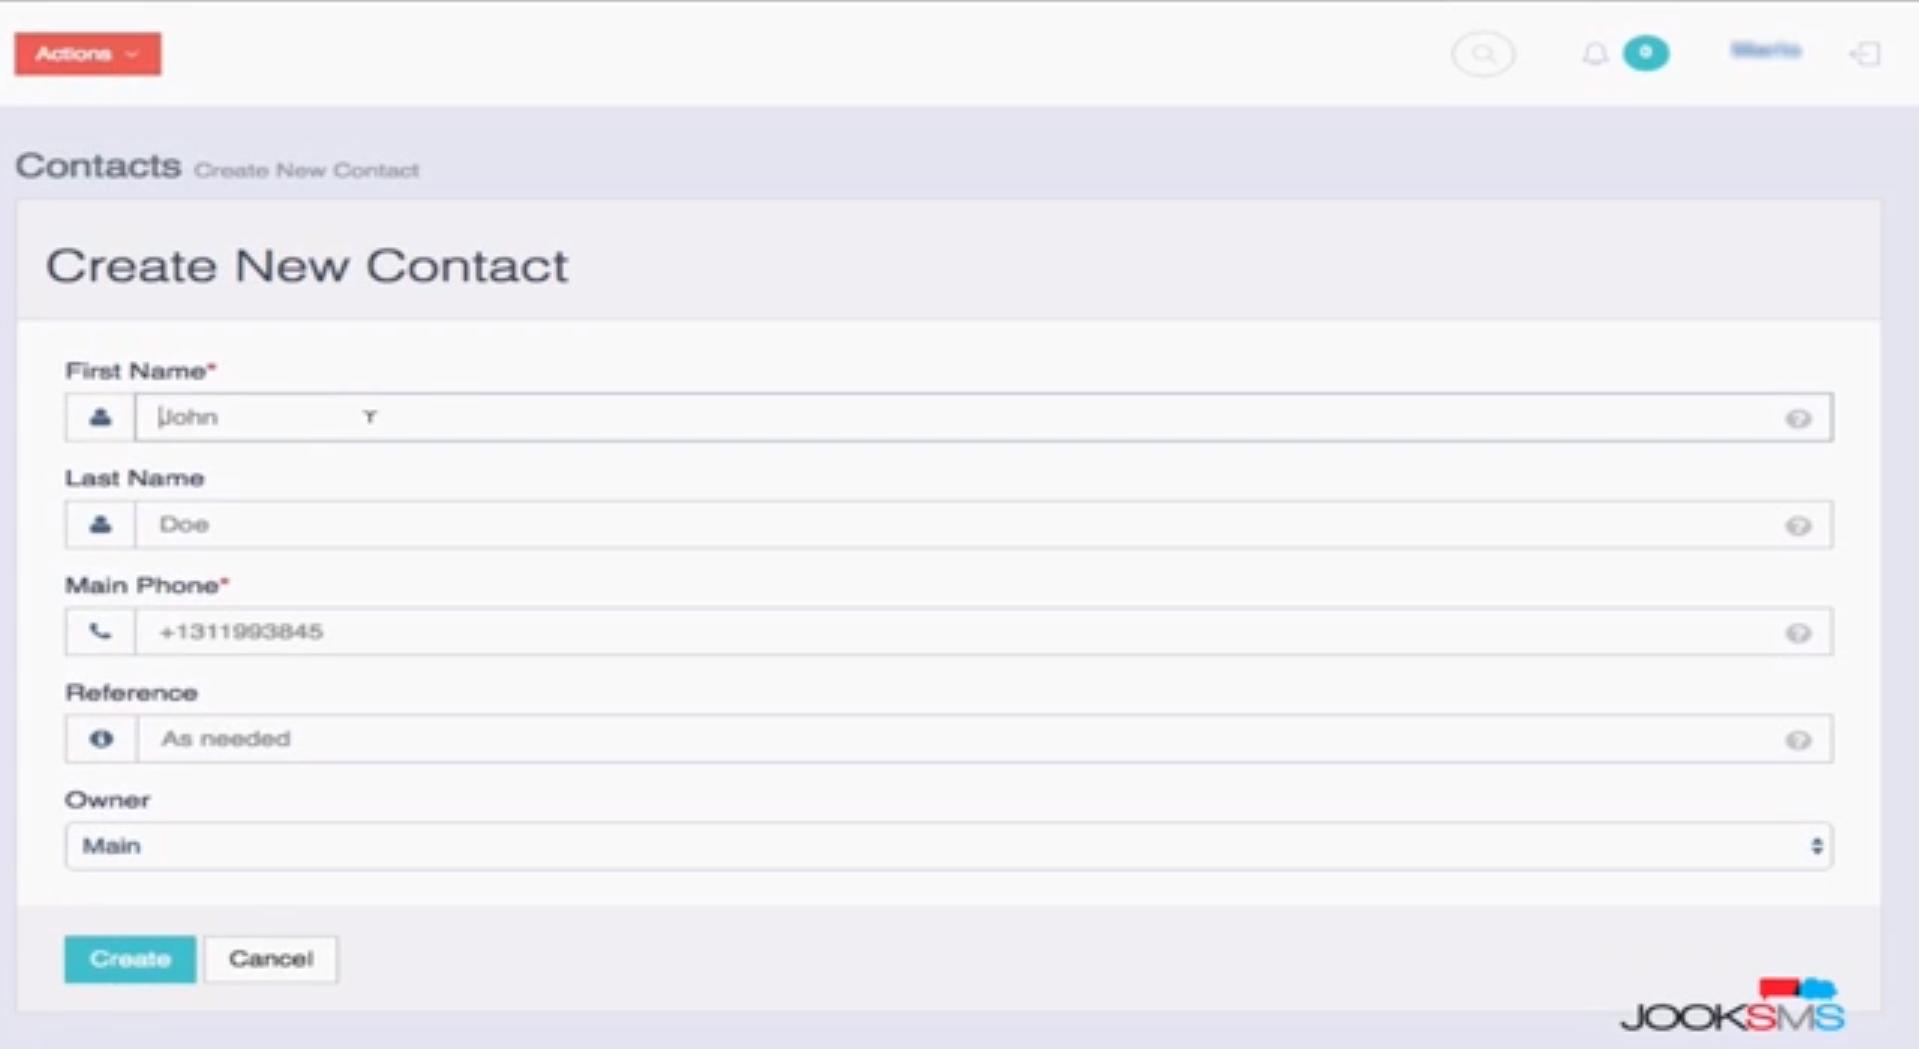 JookSMS create new contact screenshot